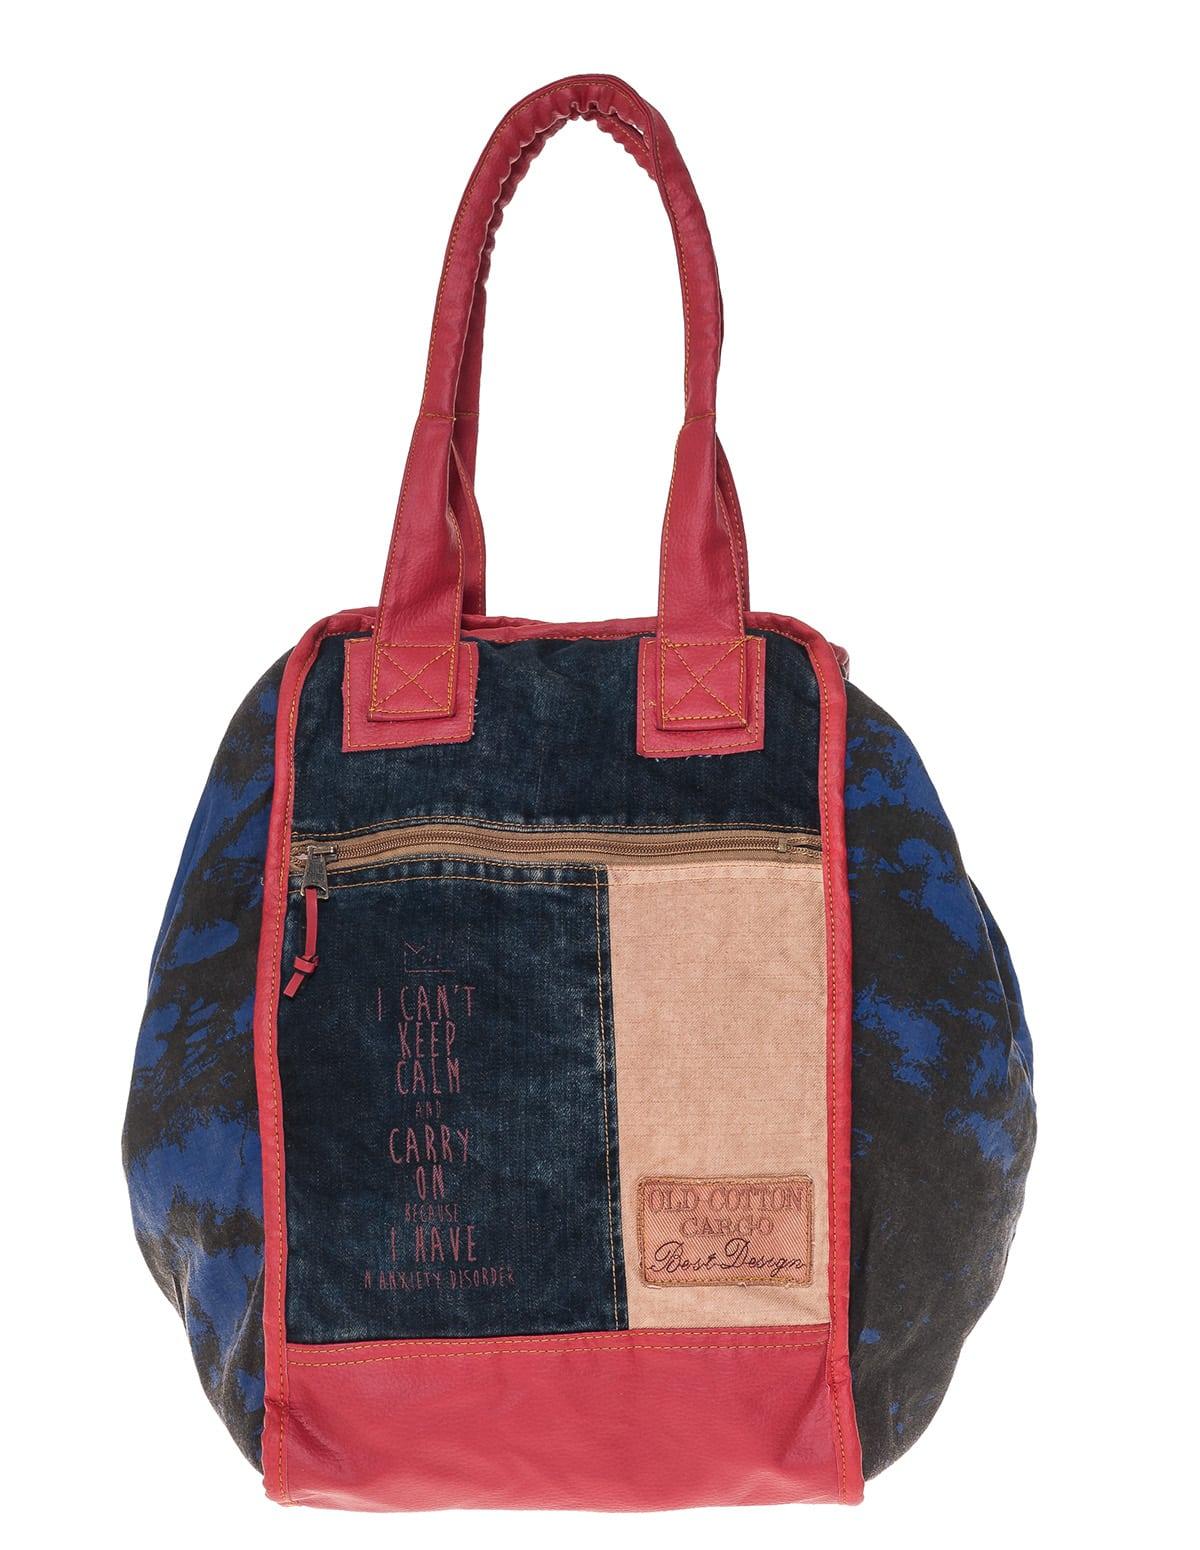 0b565f36f2 Υφασμάτινη χειροποίητη τσάντα σάκος ώμου - vactive.gr